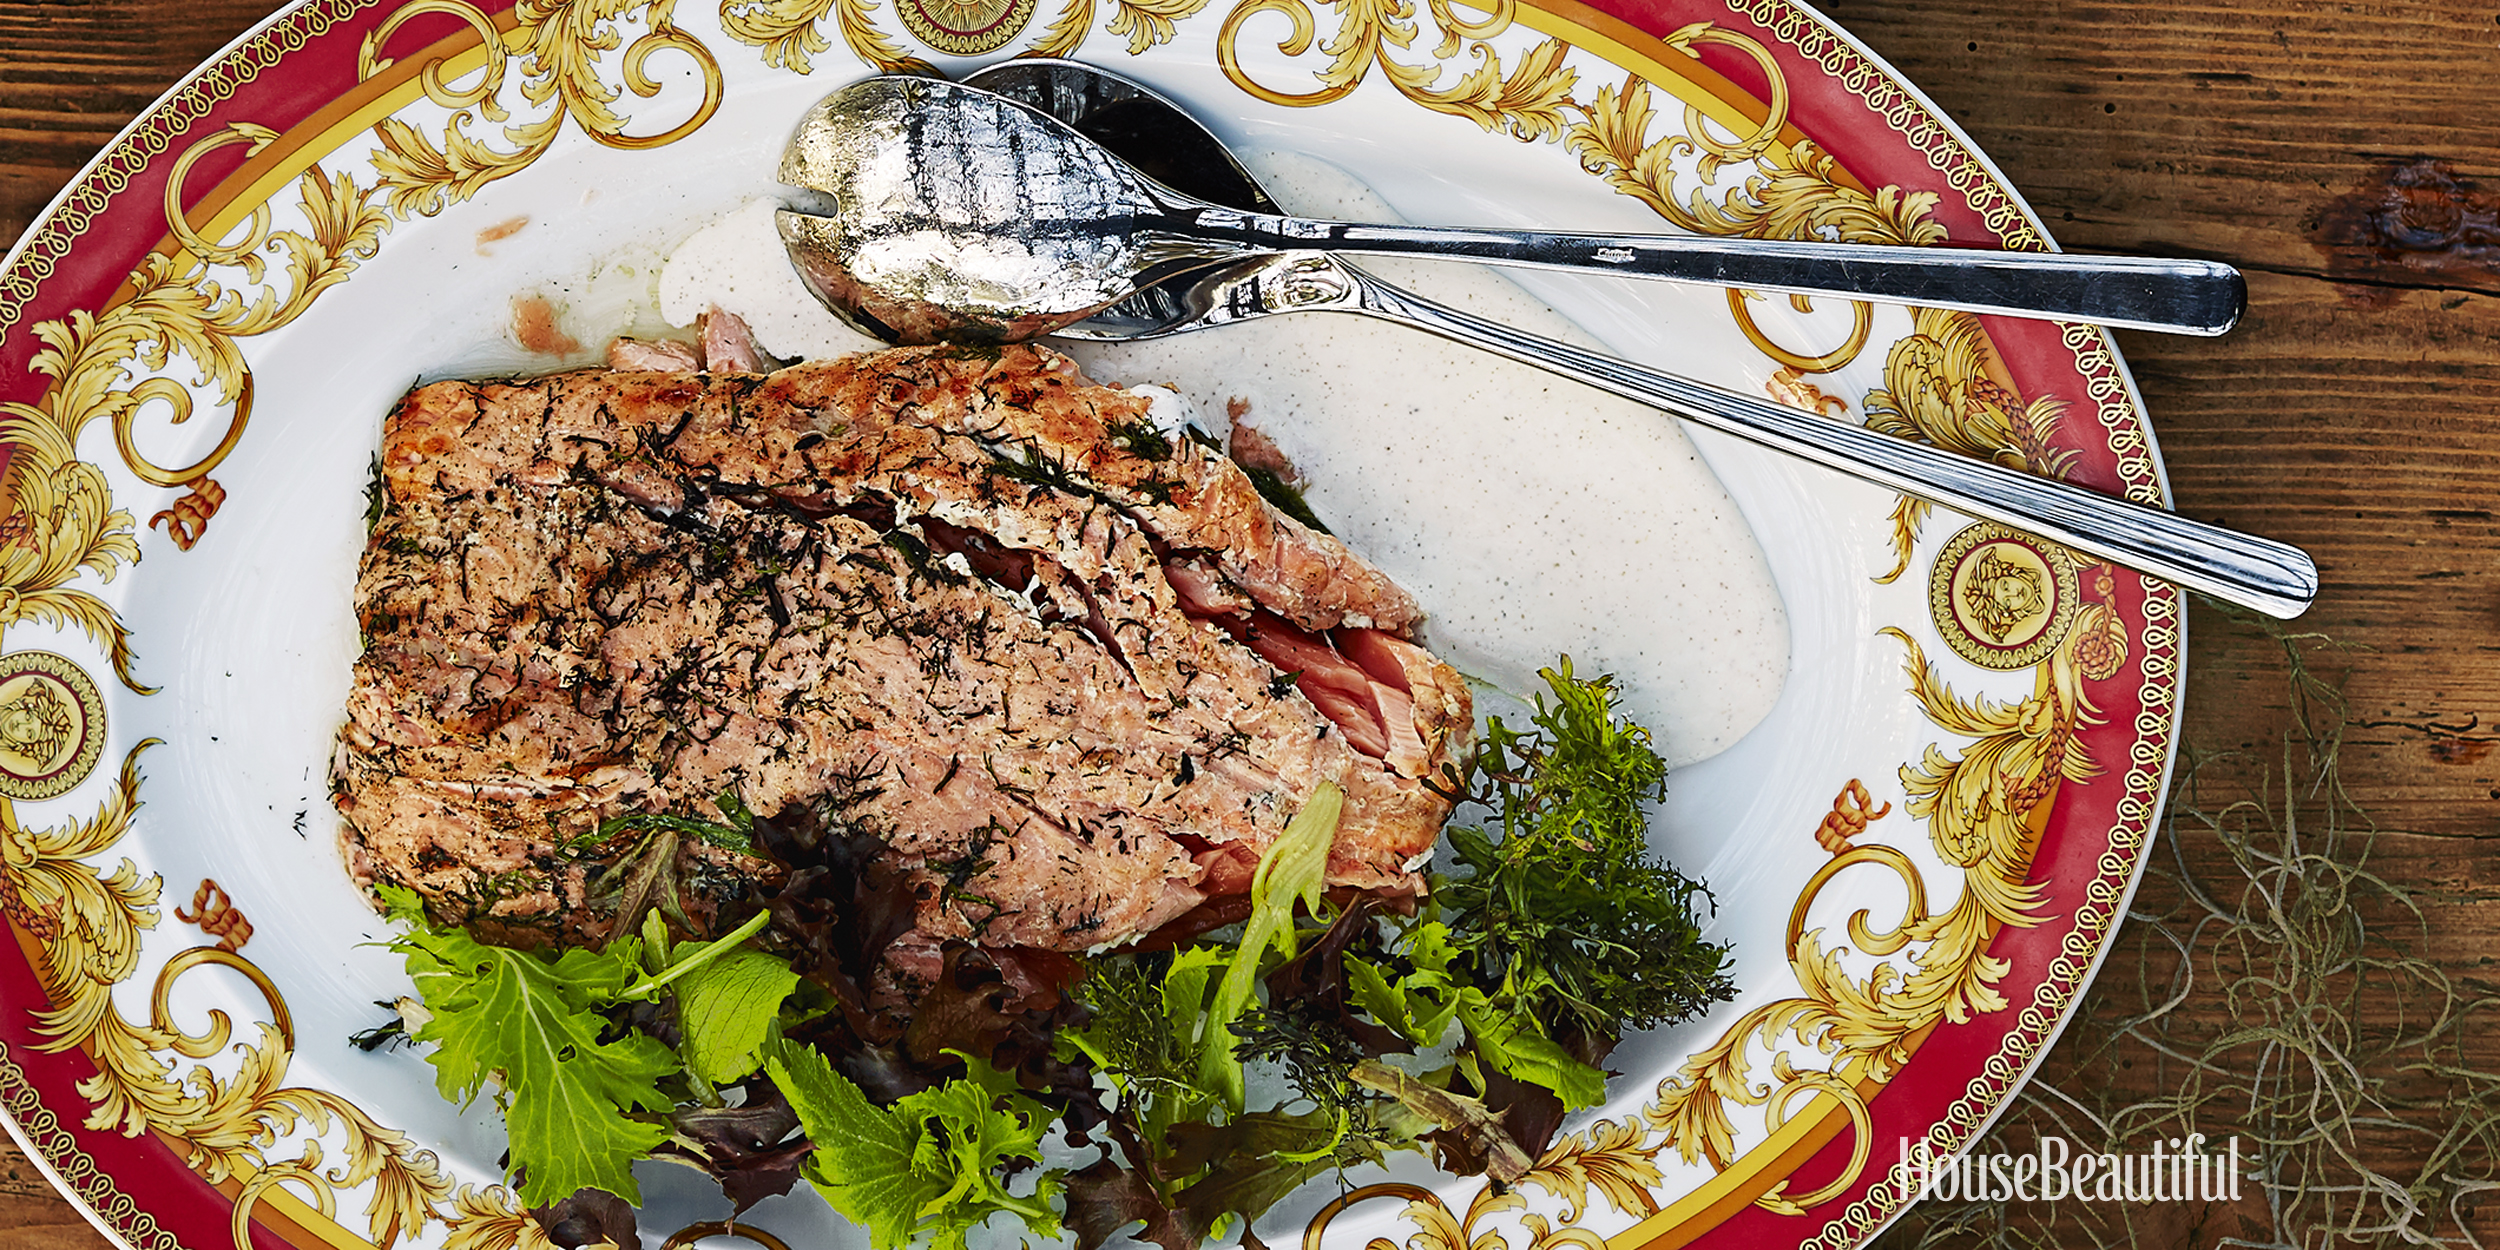 Herb-Grilled Wild Alaskan Salmon With Buttermilk Dressing - John Besh ...